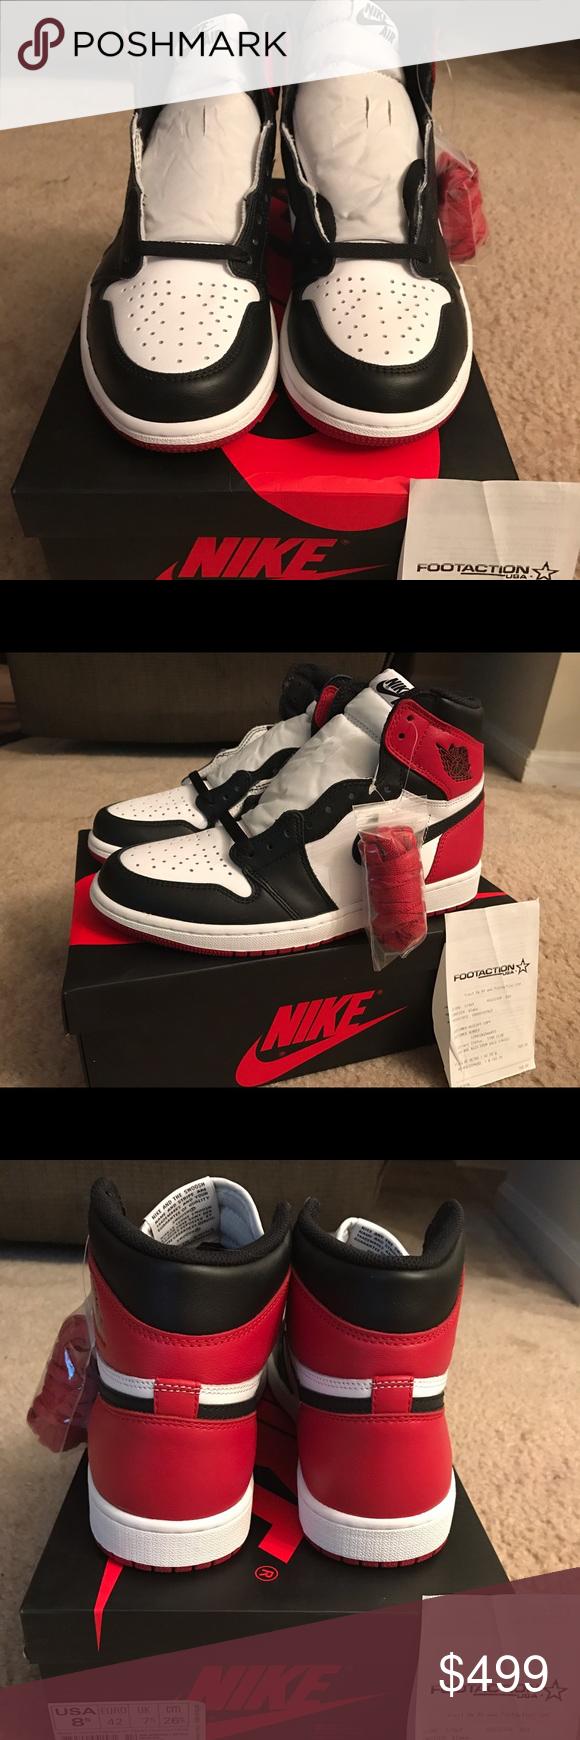 Buy Cheap Jordan RL Shoes for Sale Online